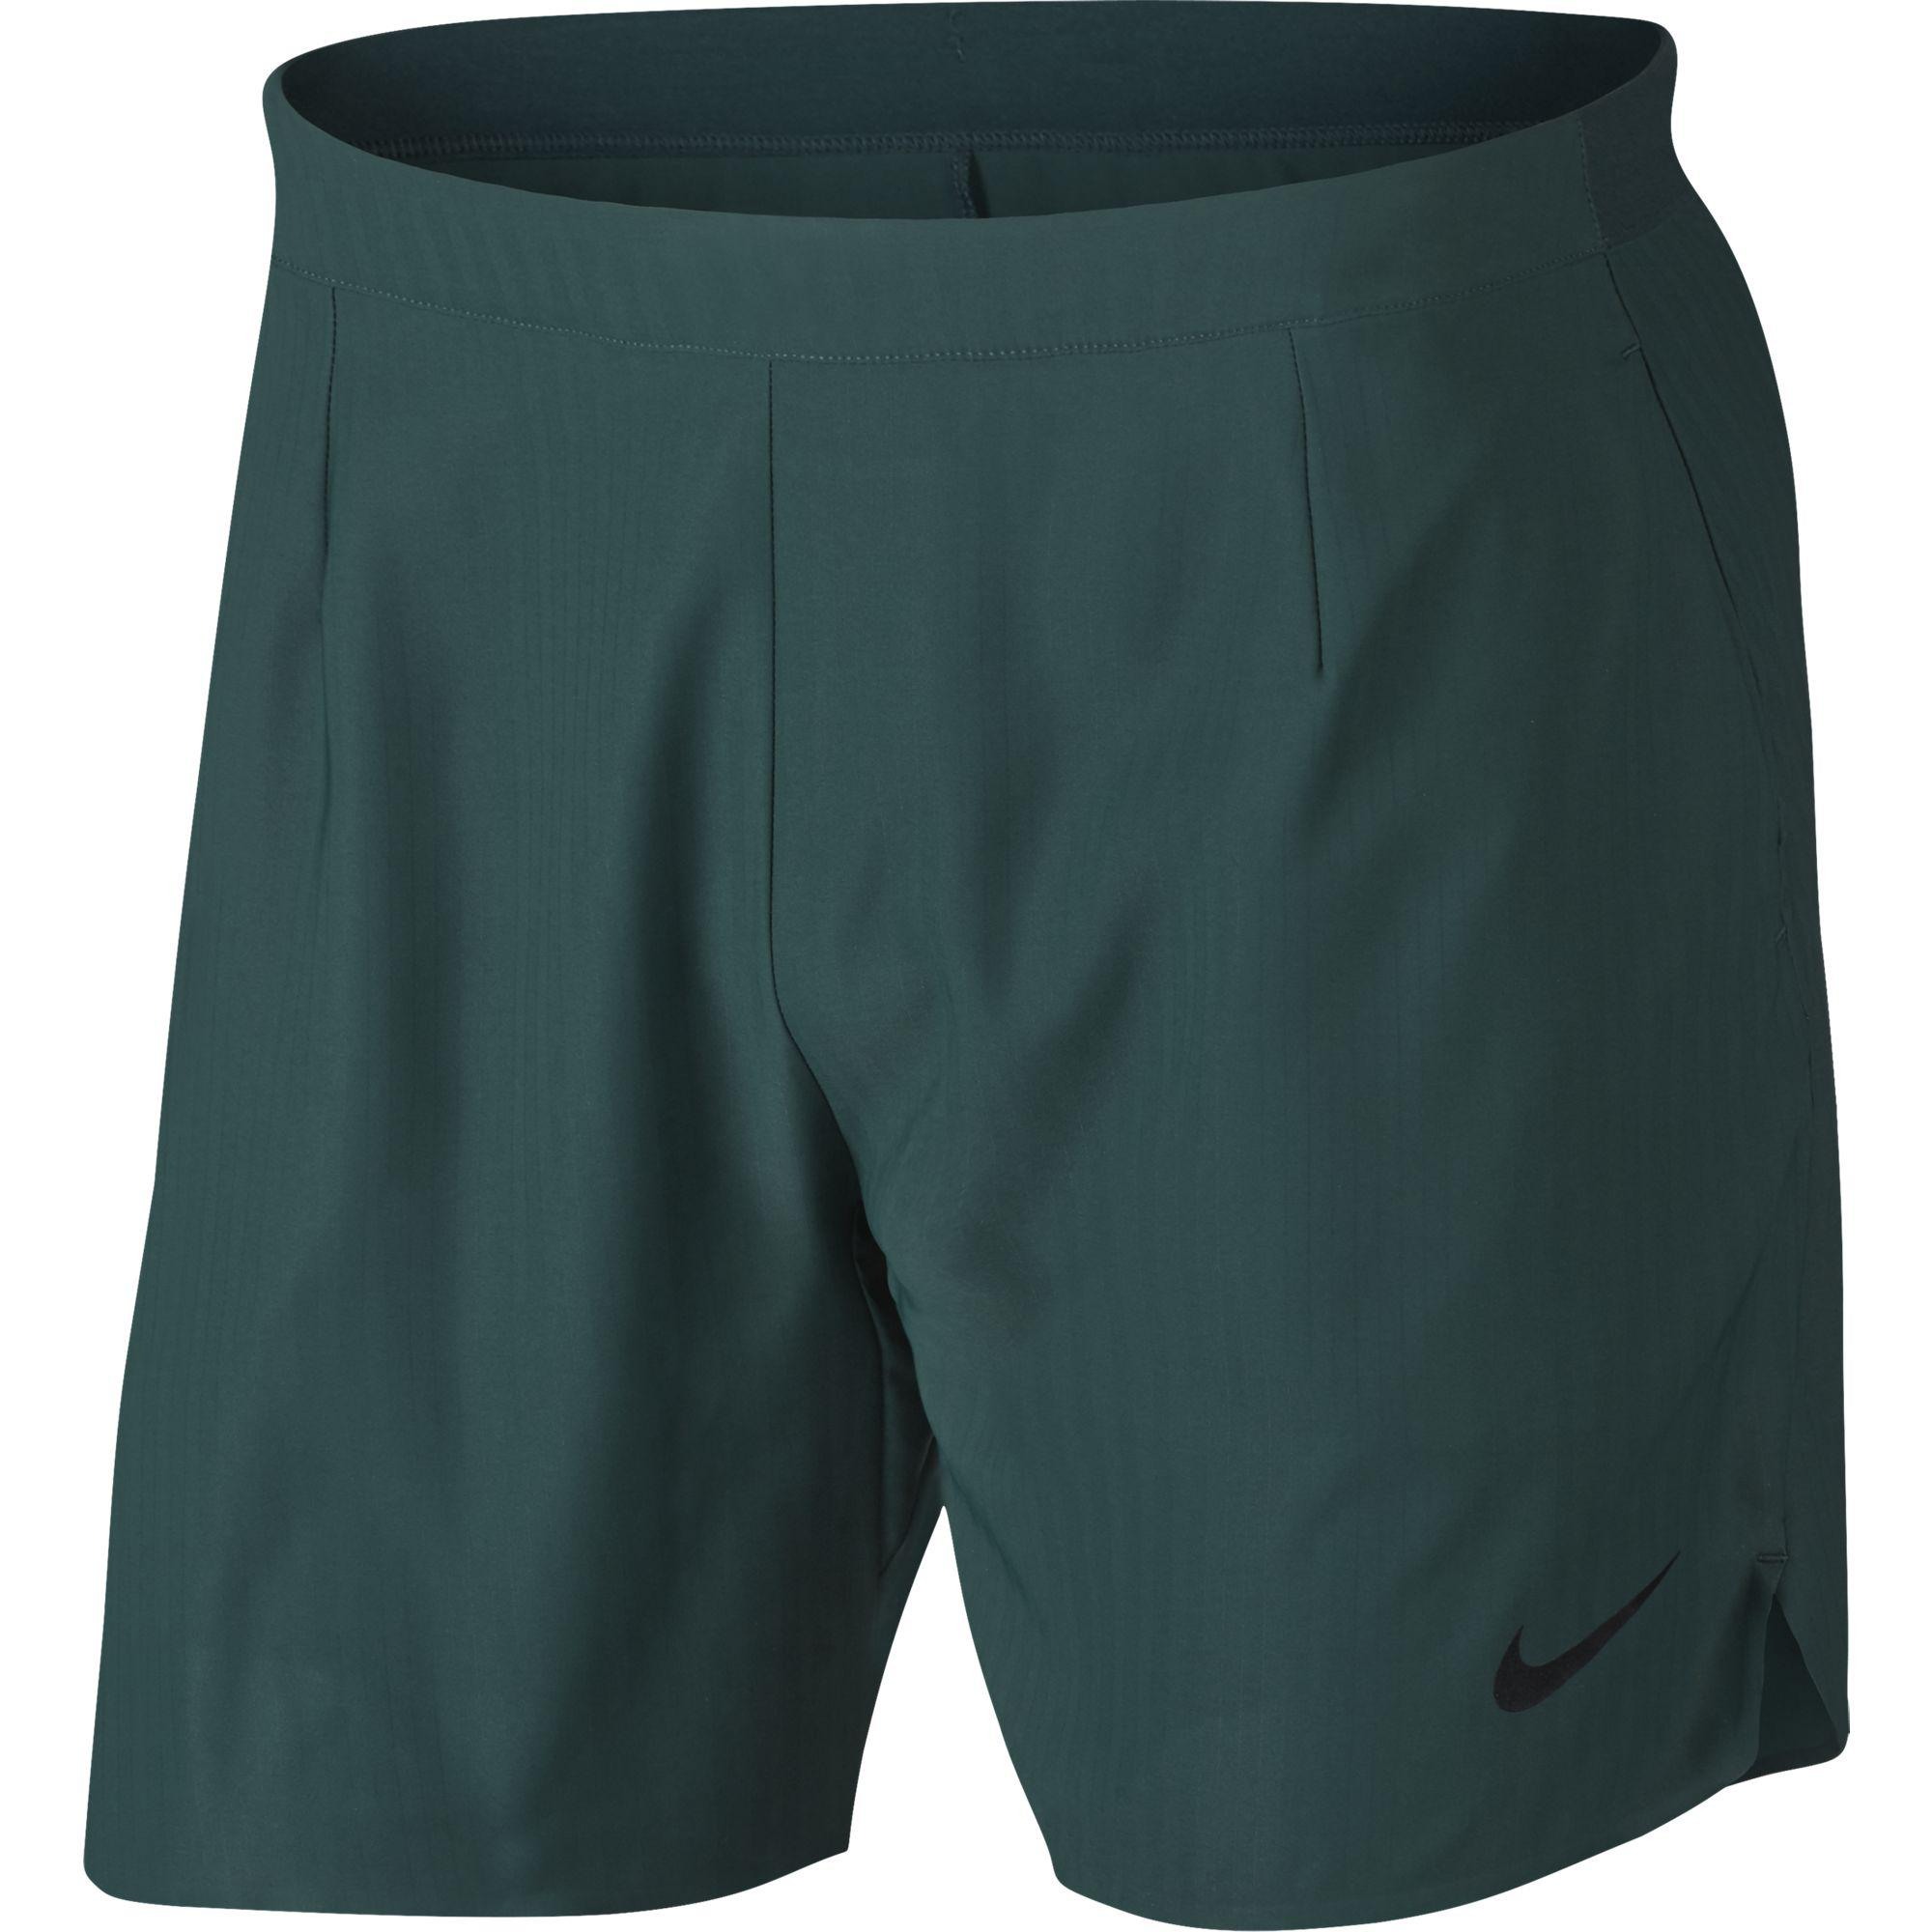 153d53213ae5 Nike Mens Flex Ace 7 Inch Shorts - Dark Green - Tennisnuts.com